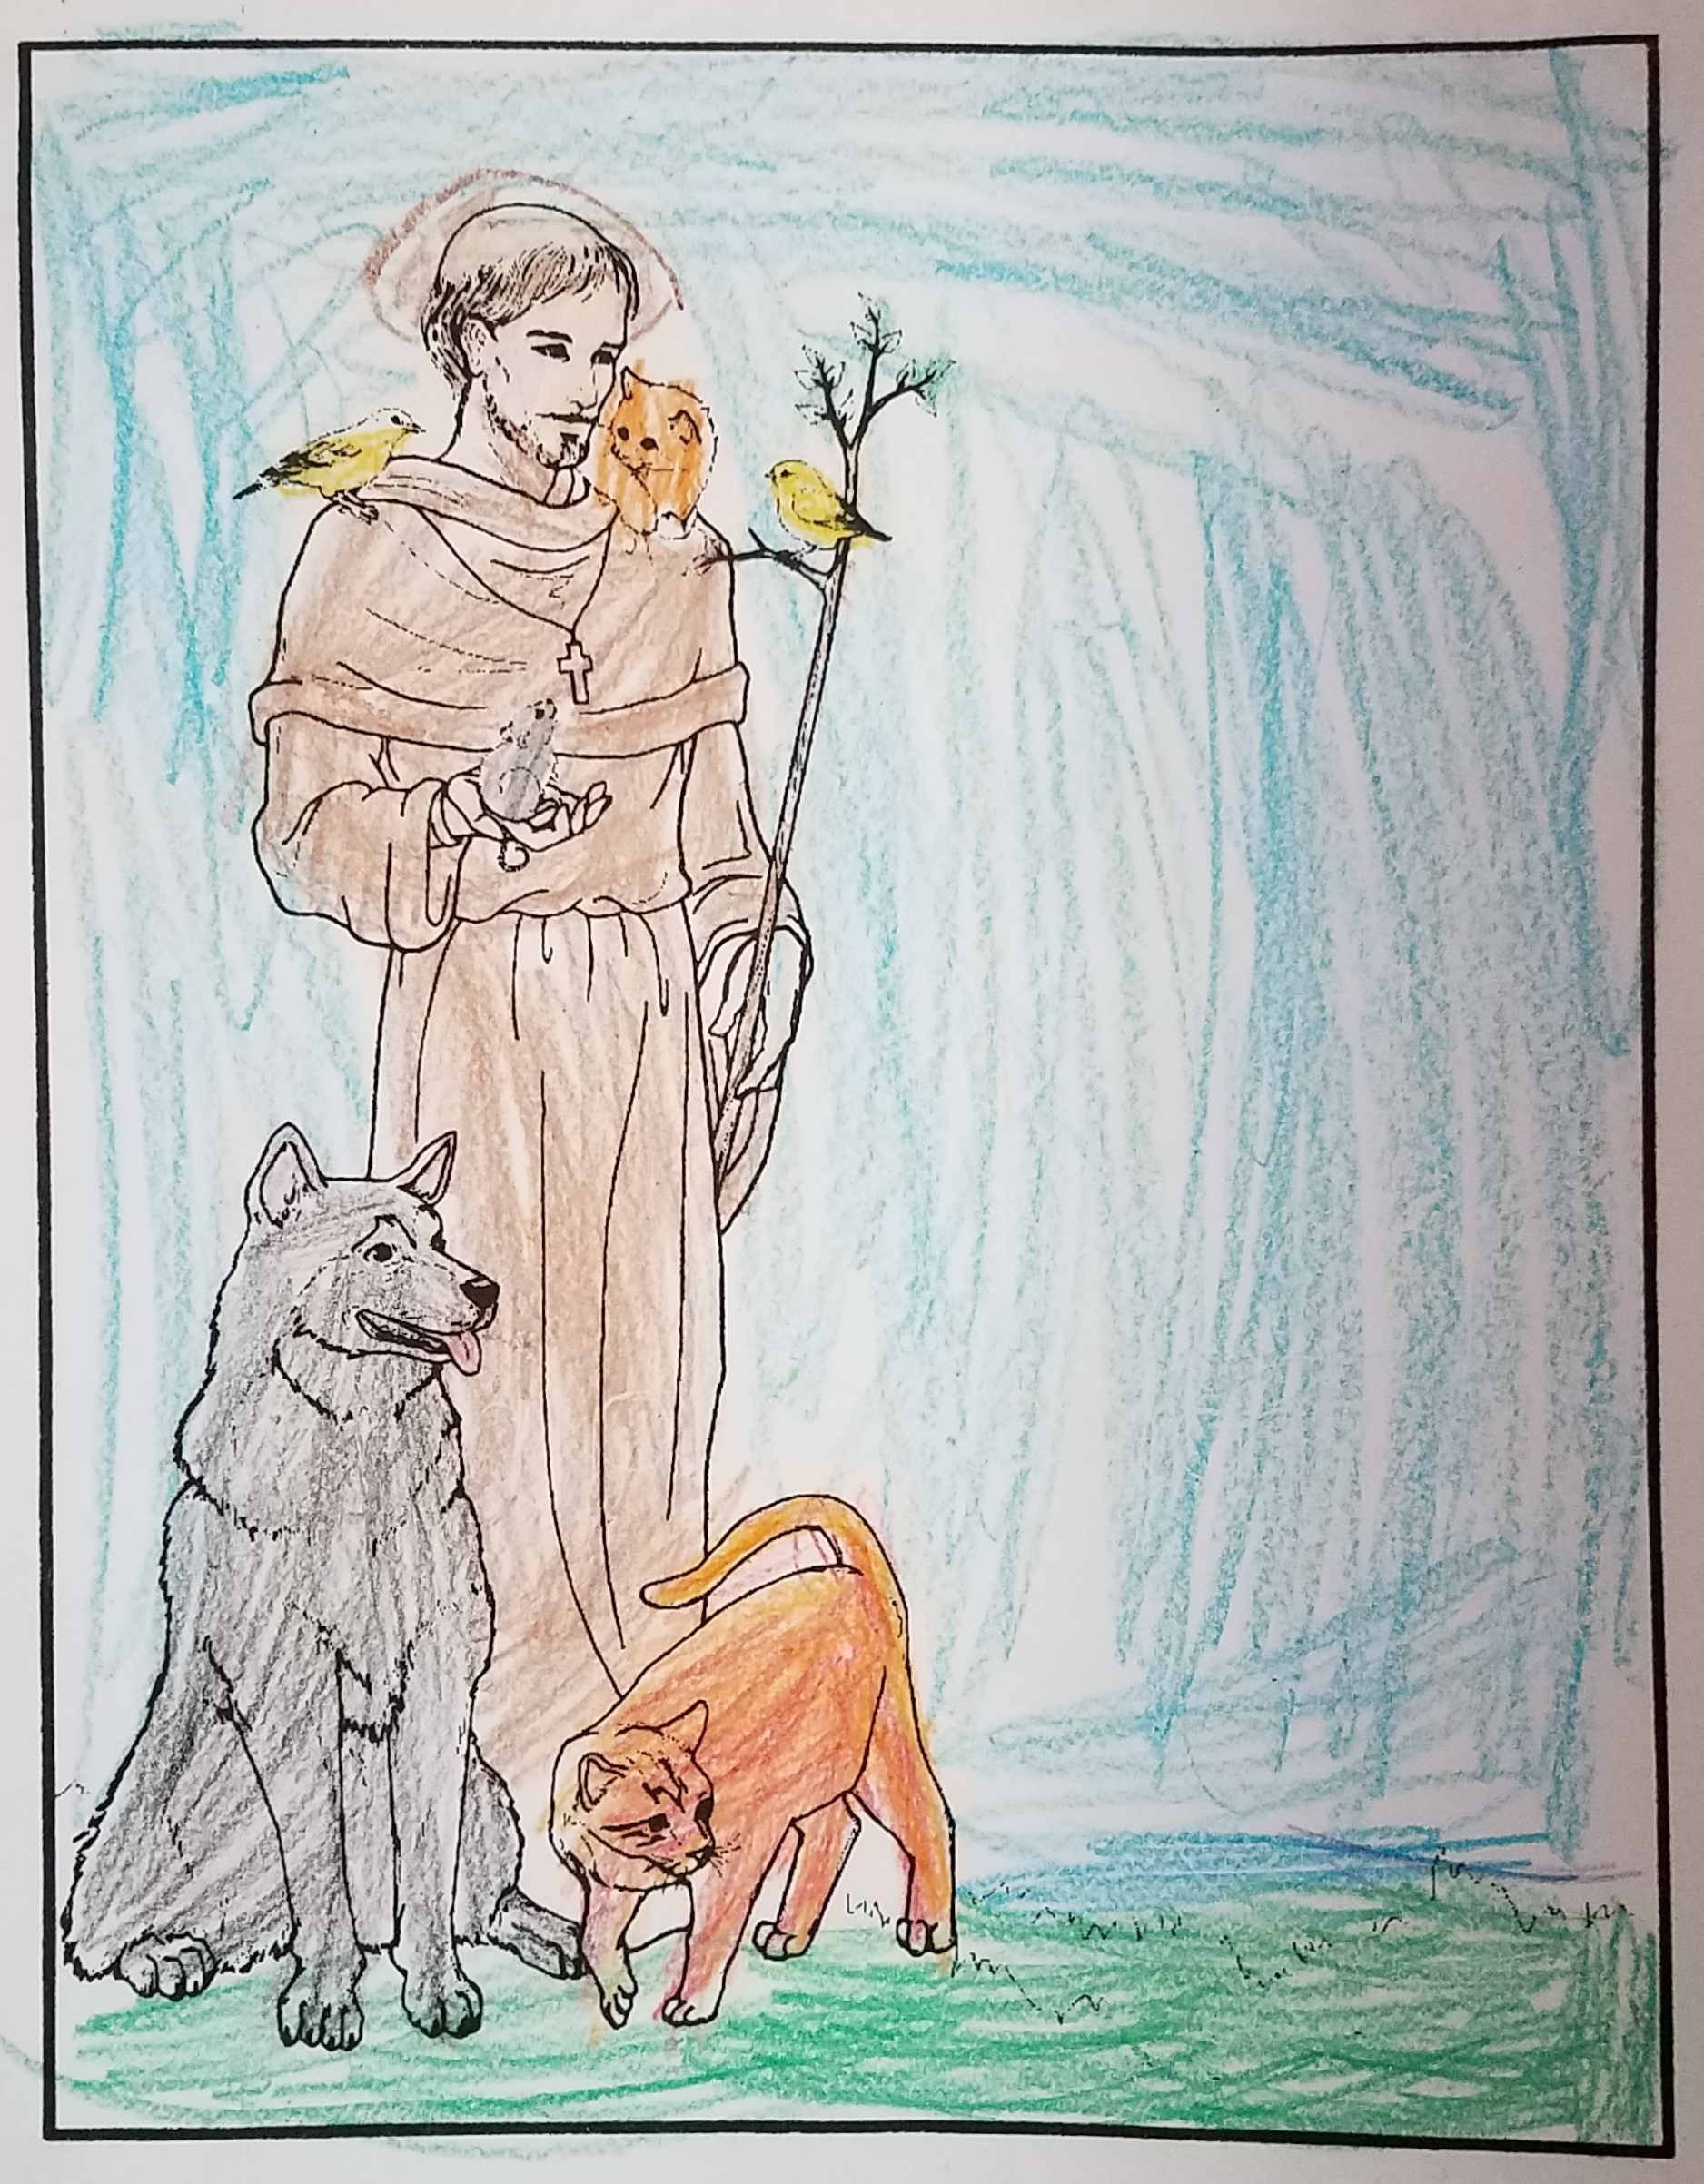 Saint Francis Coloring Book Page.jpg